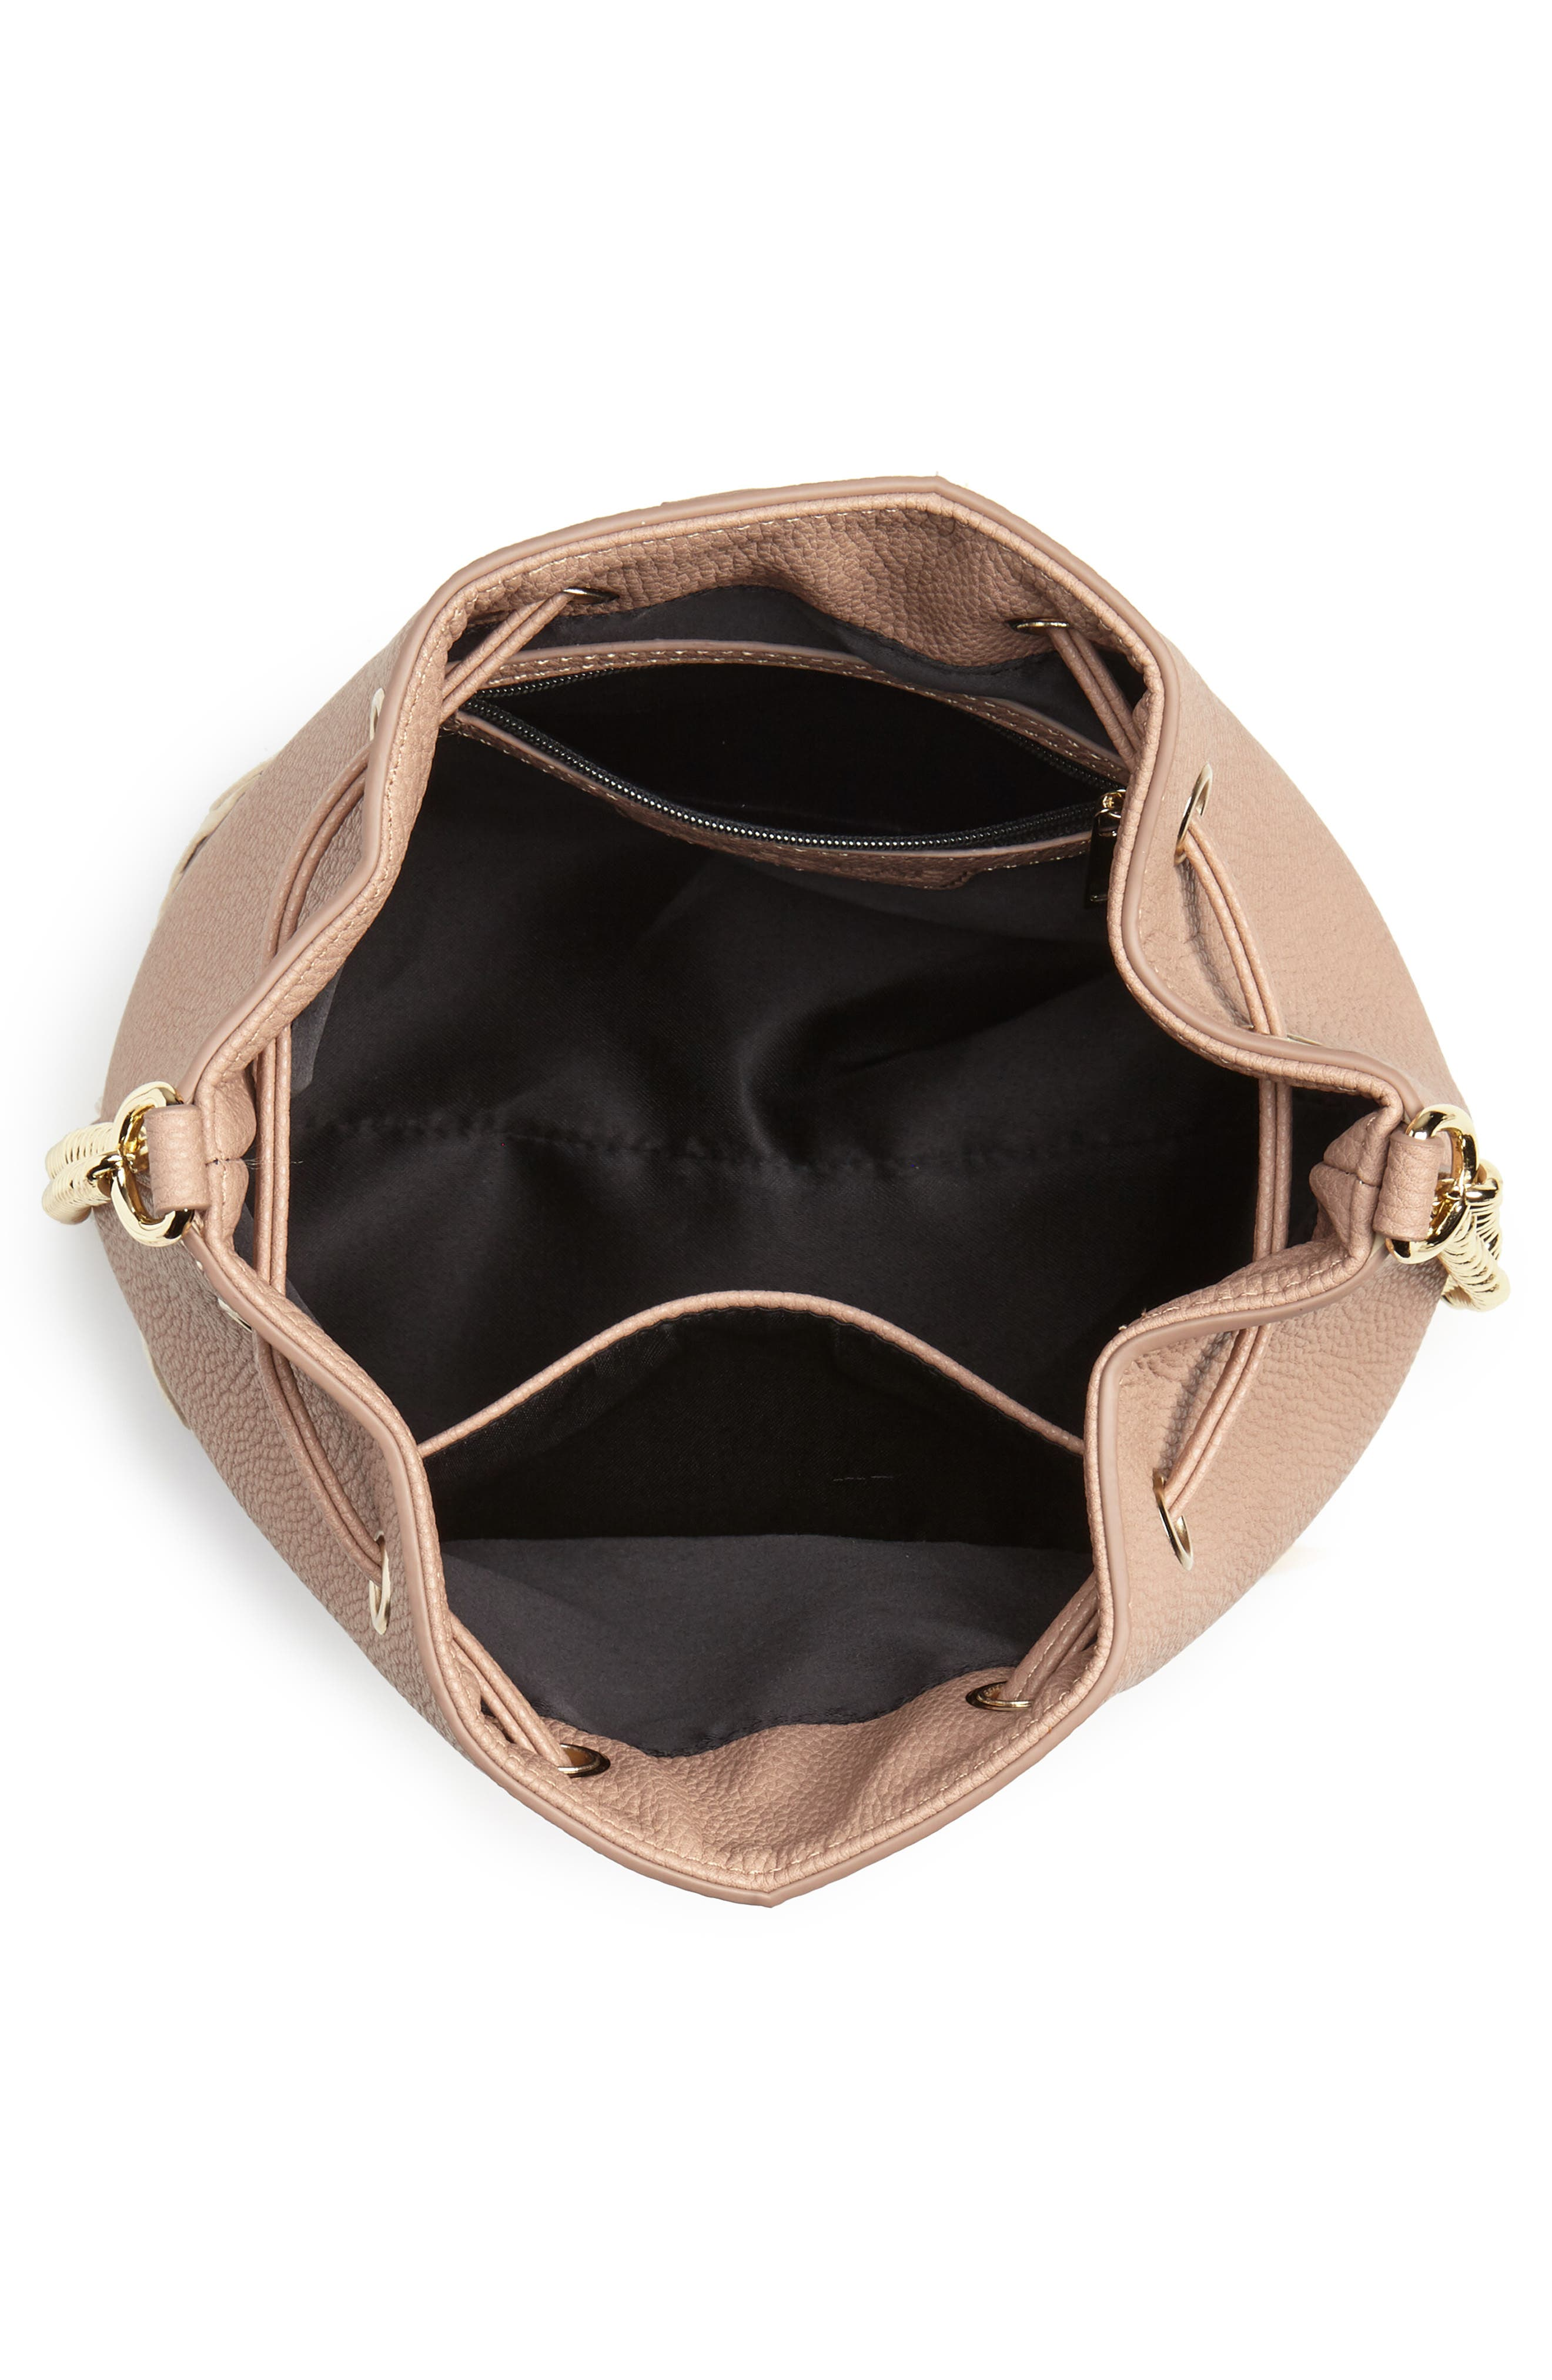 Veronica Faux Leather Bucket Bag,                             Alternate thumbnail 4, color,                             250